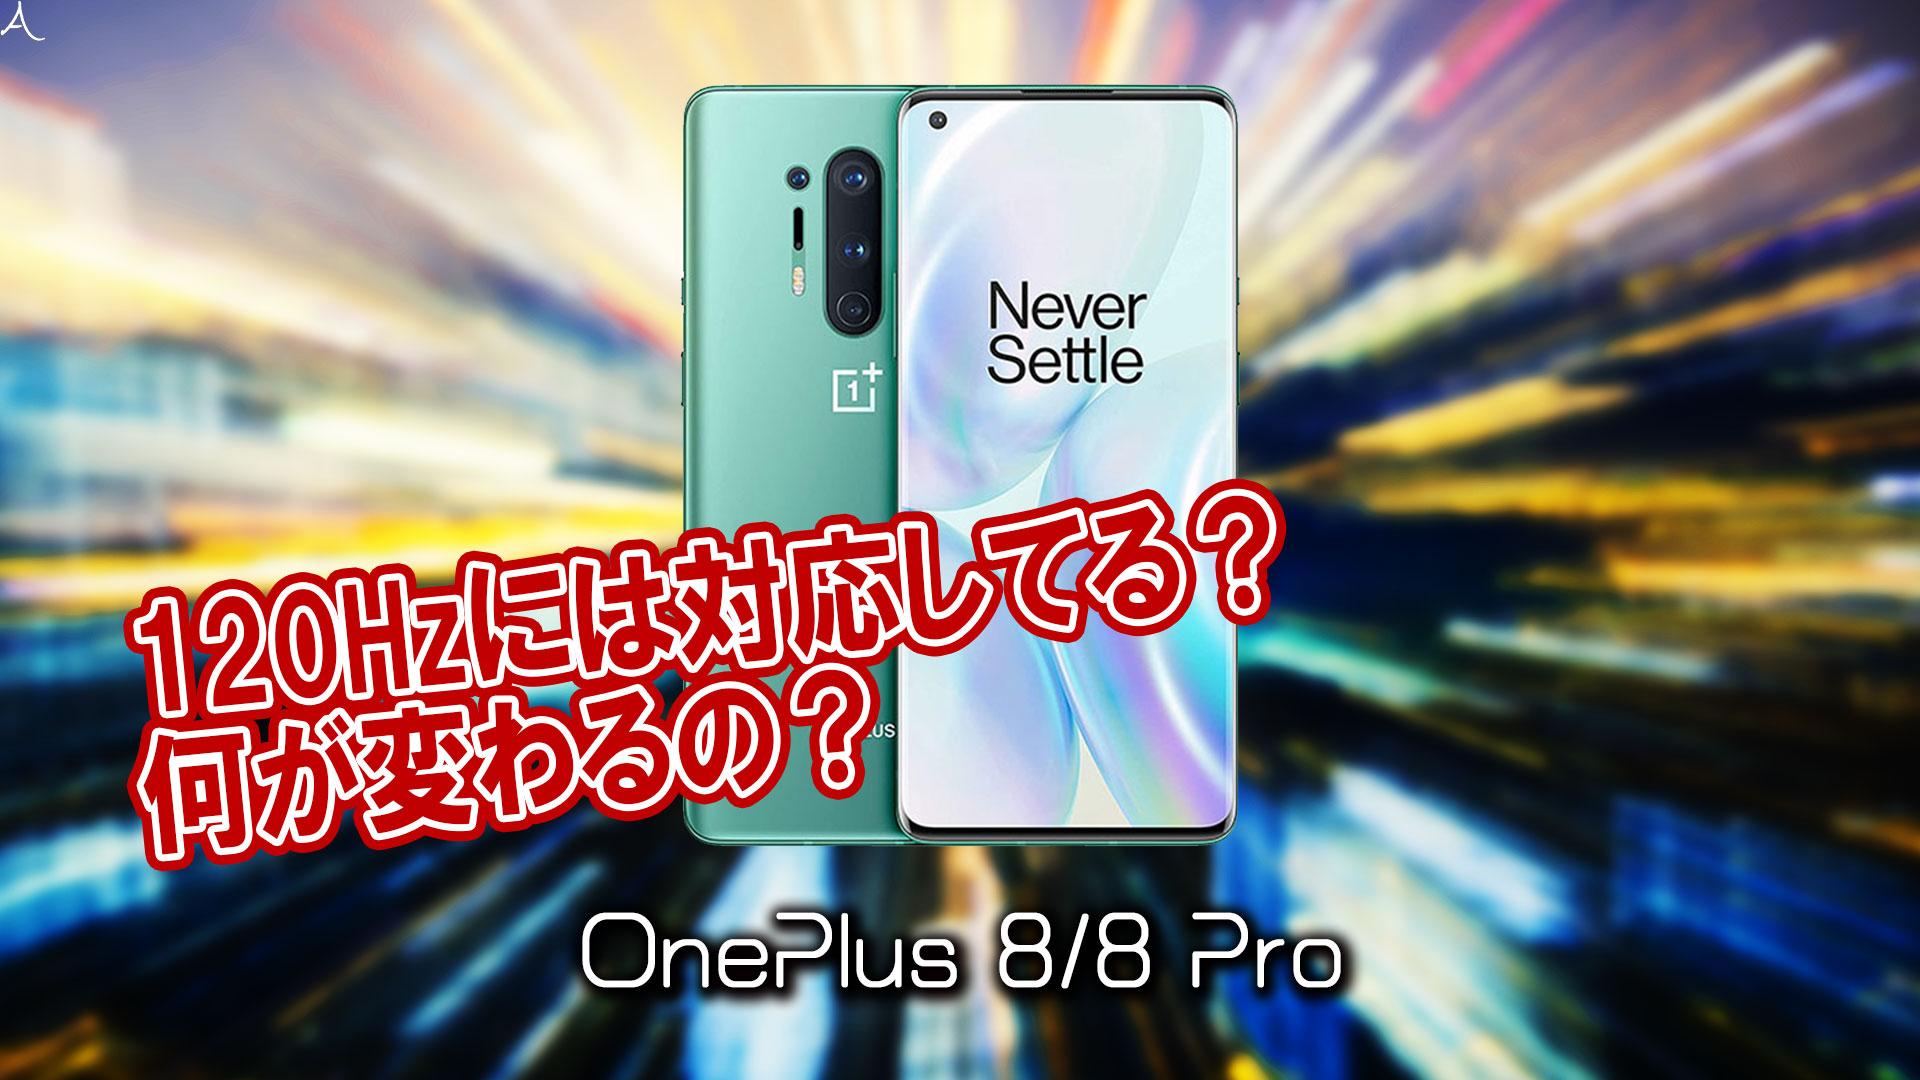 「OnePlus 8/8 Pro」のリフレッシュレートはいくつ?120Hzには対応してる?